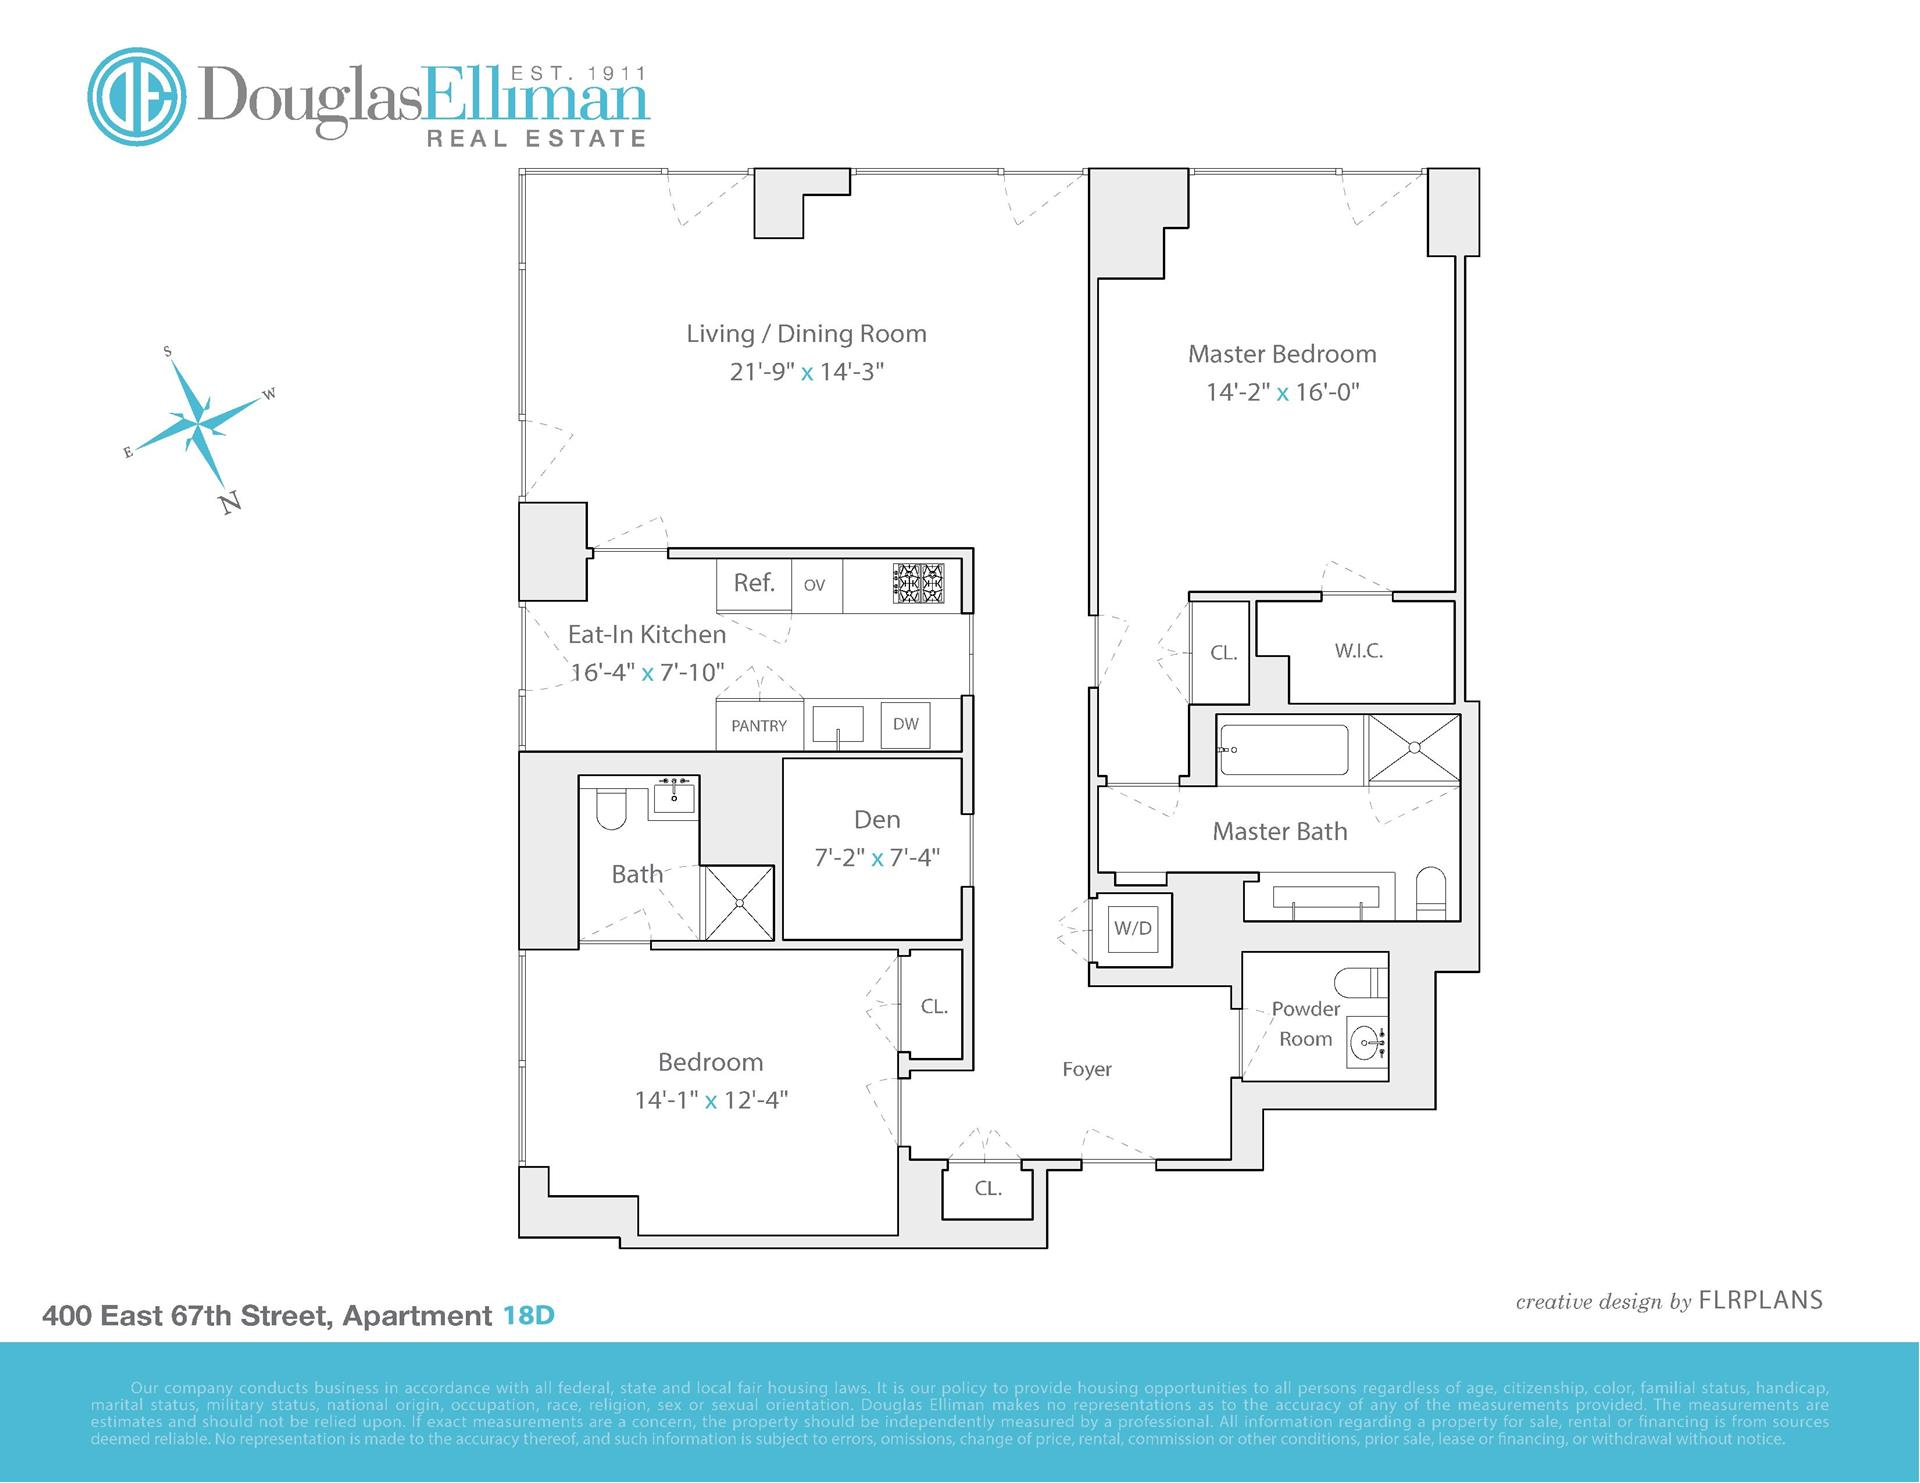 Floor plan of The Laurel, 400 East 67th St, 18D - Upper East Side, New York